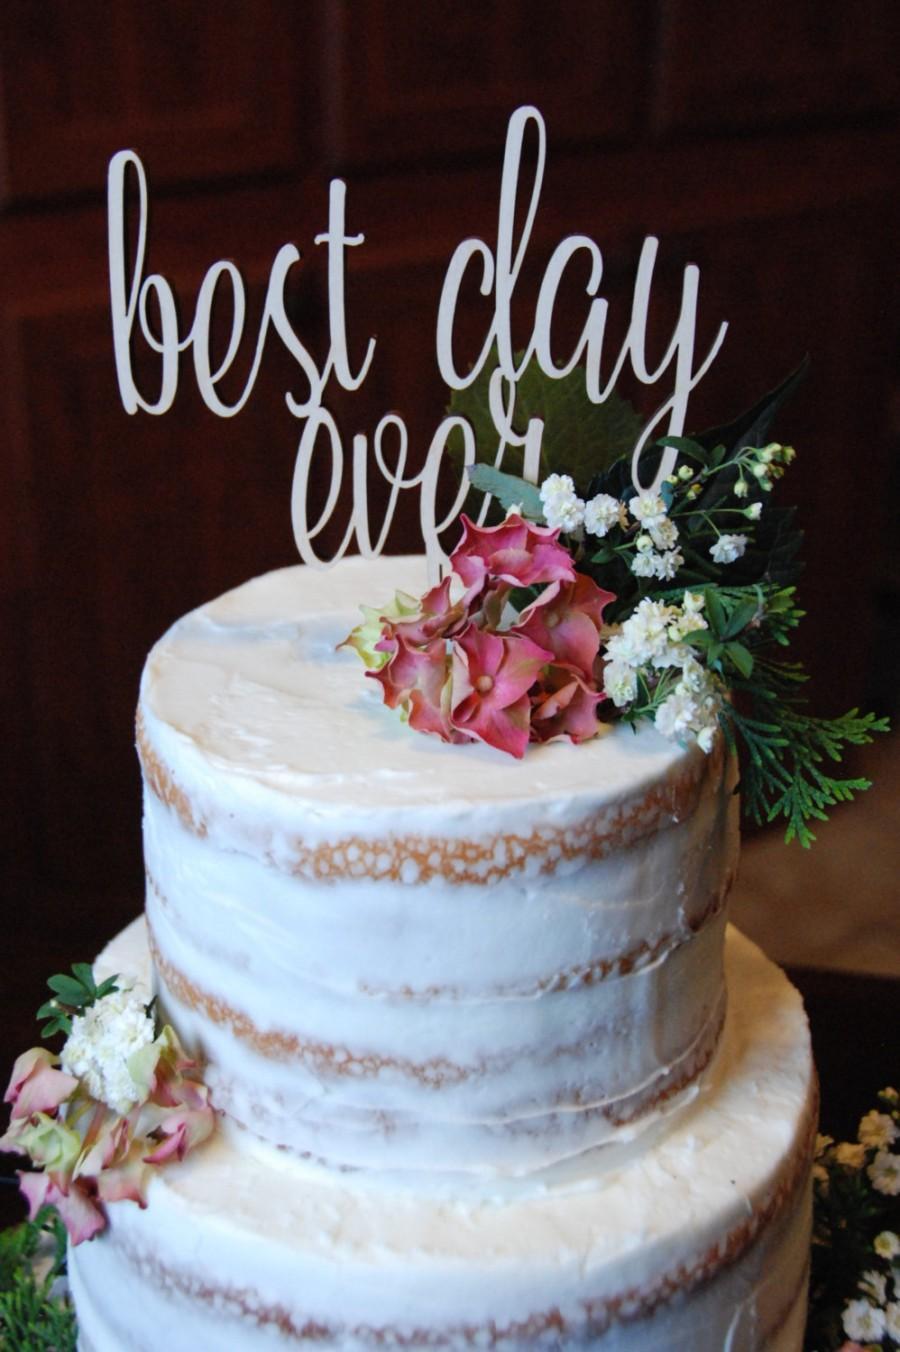 Свадьба - Best Day Ever Cake Topper - Wedding Cake Topper - Birthday Cake Topper - Celebration - Party